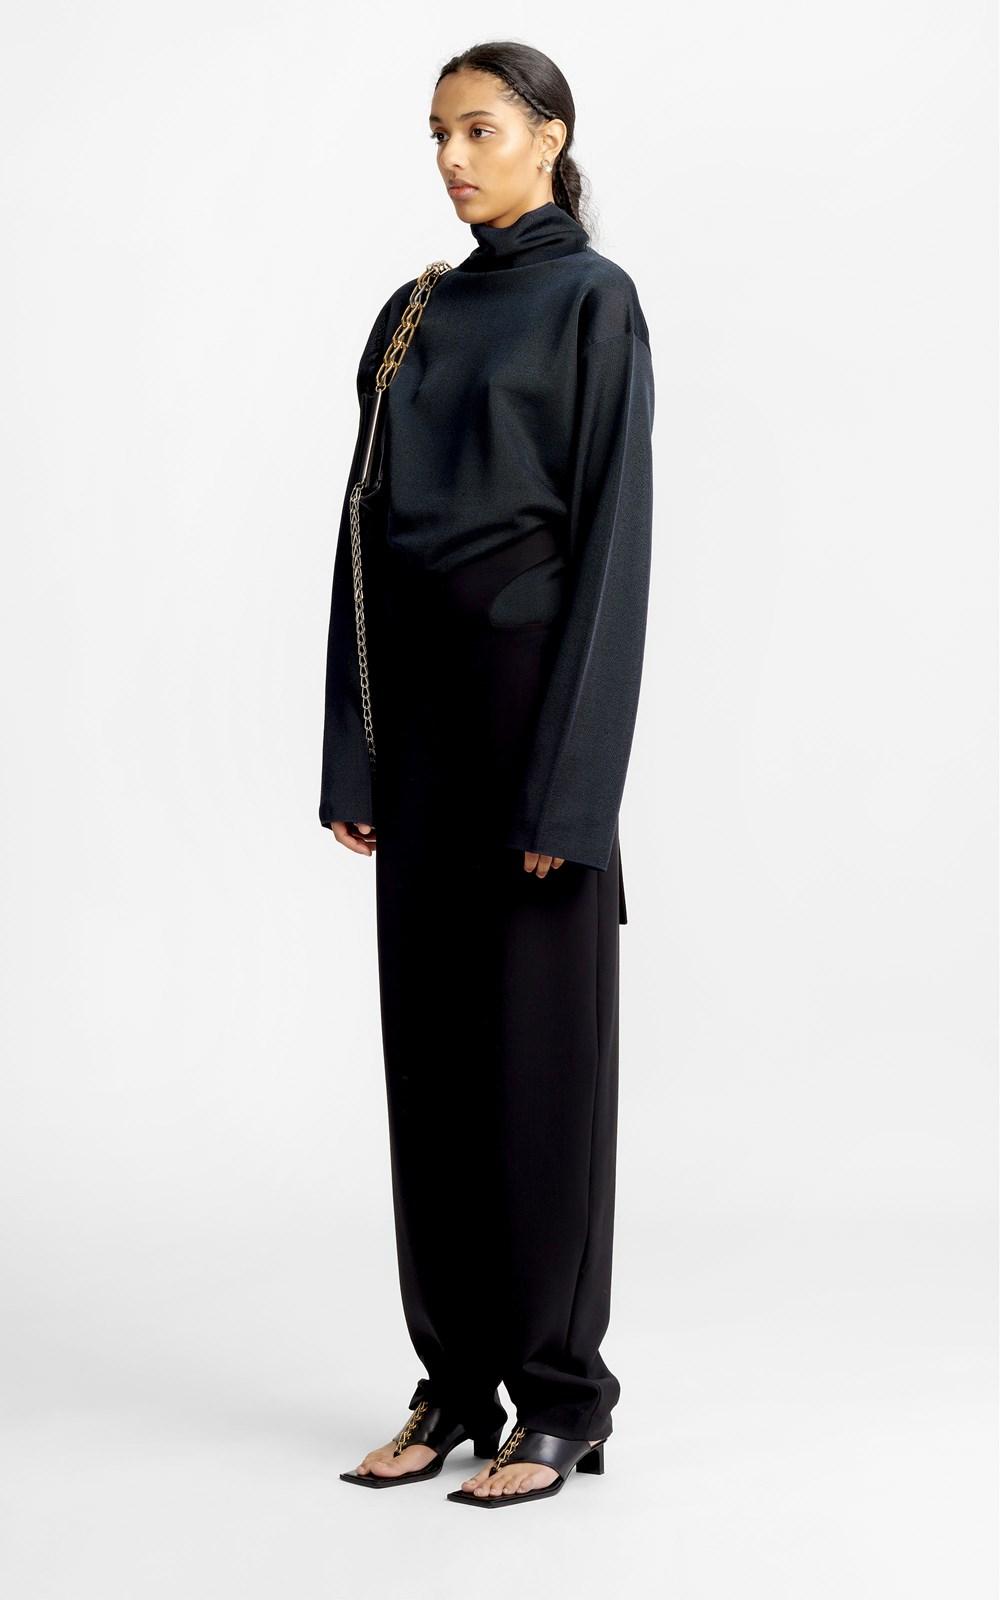 Knitwear | FROSTED SWEATER